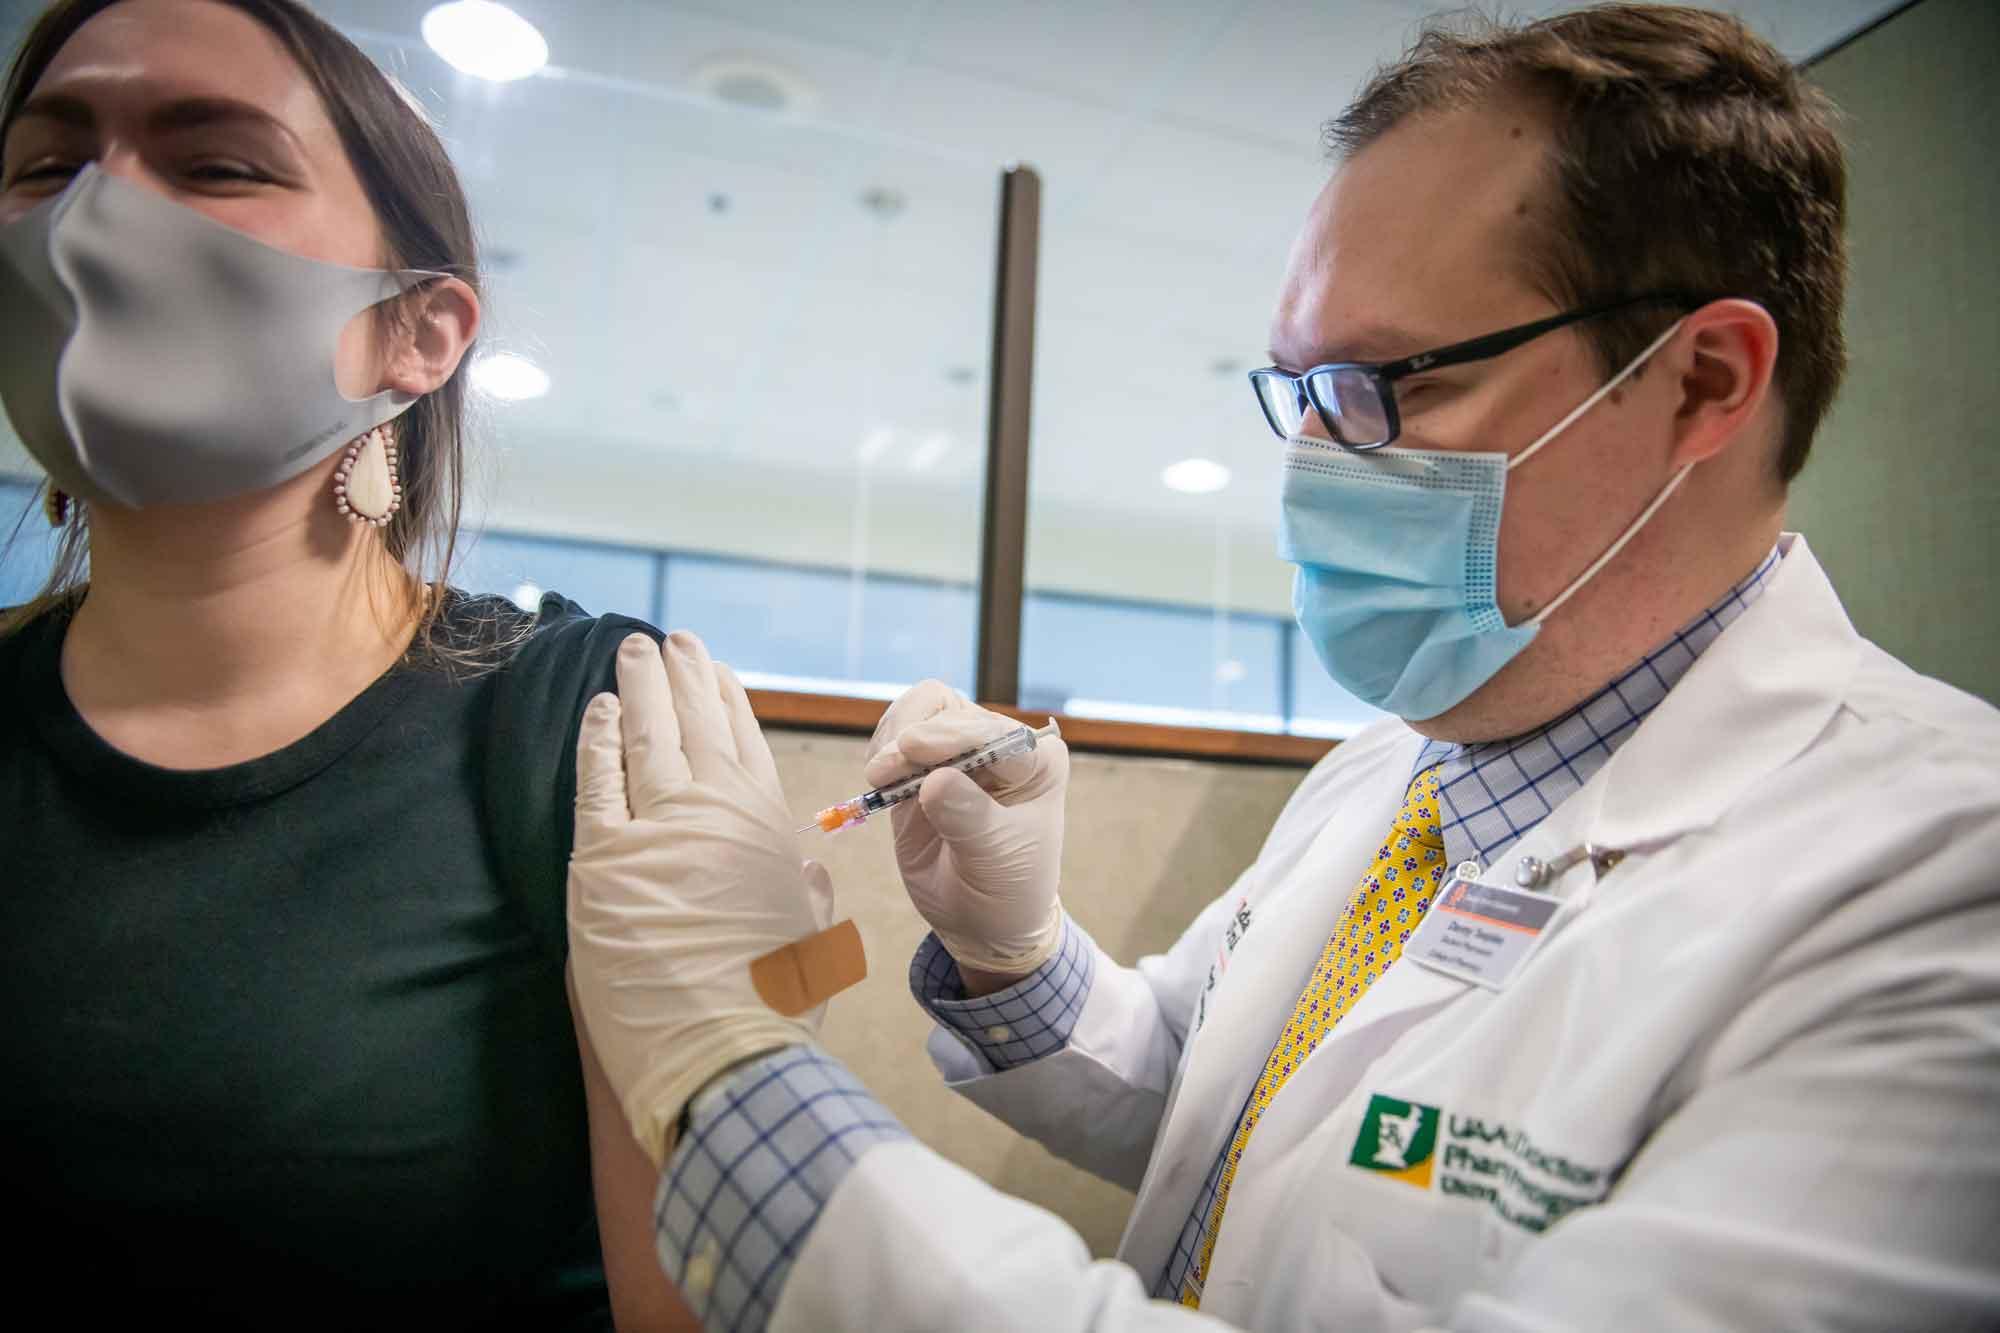 UAA pharmacy student administers COVID-19 vaccine